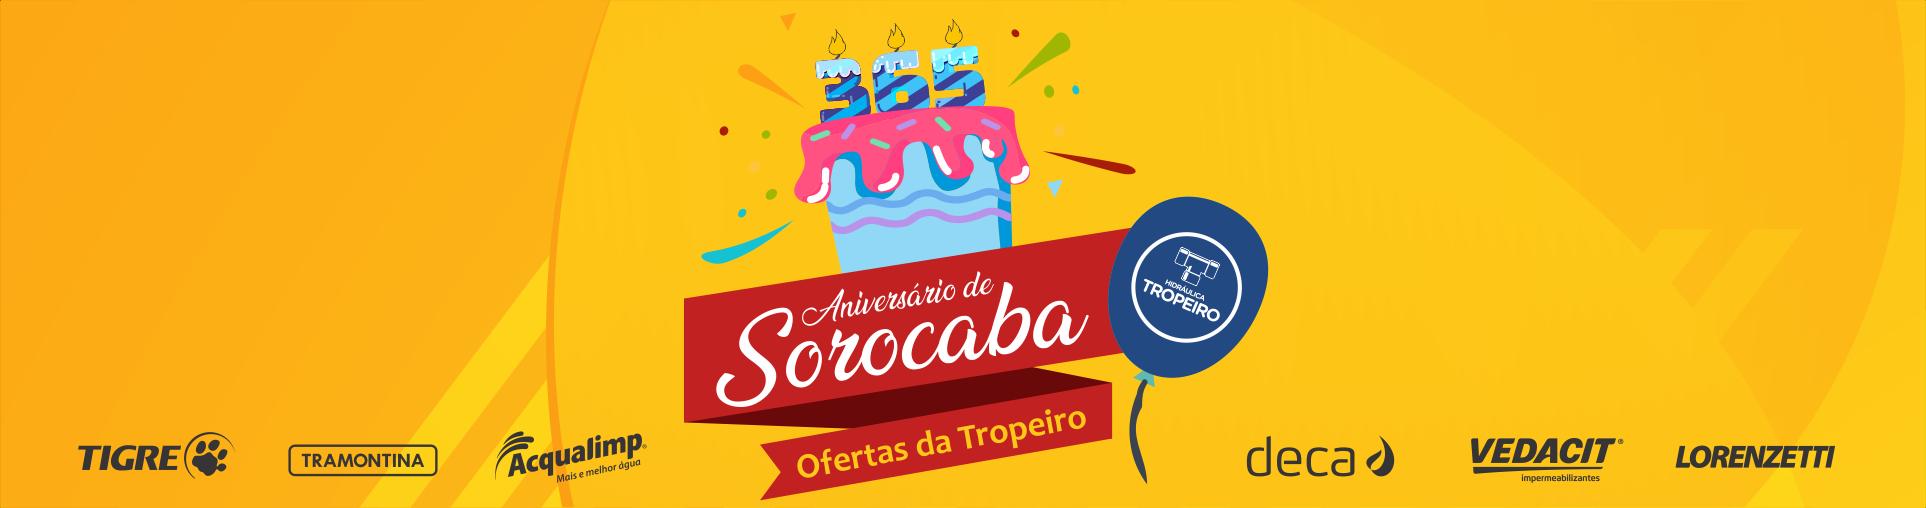 Aniversário Sorocaba